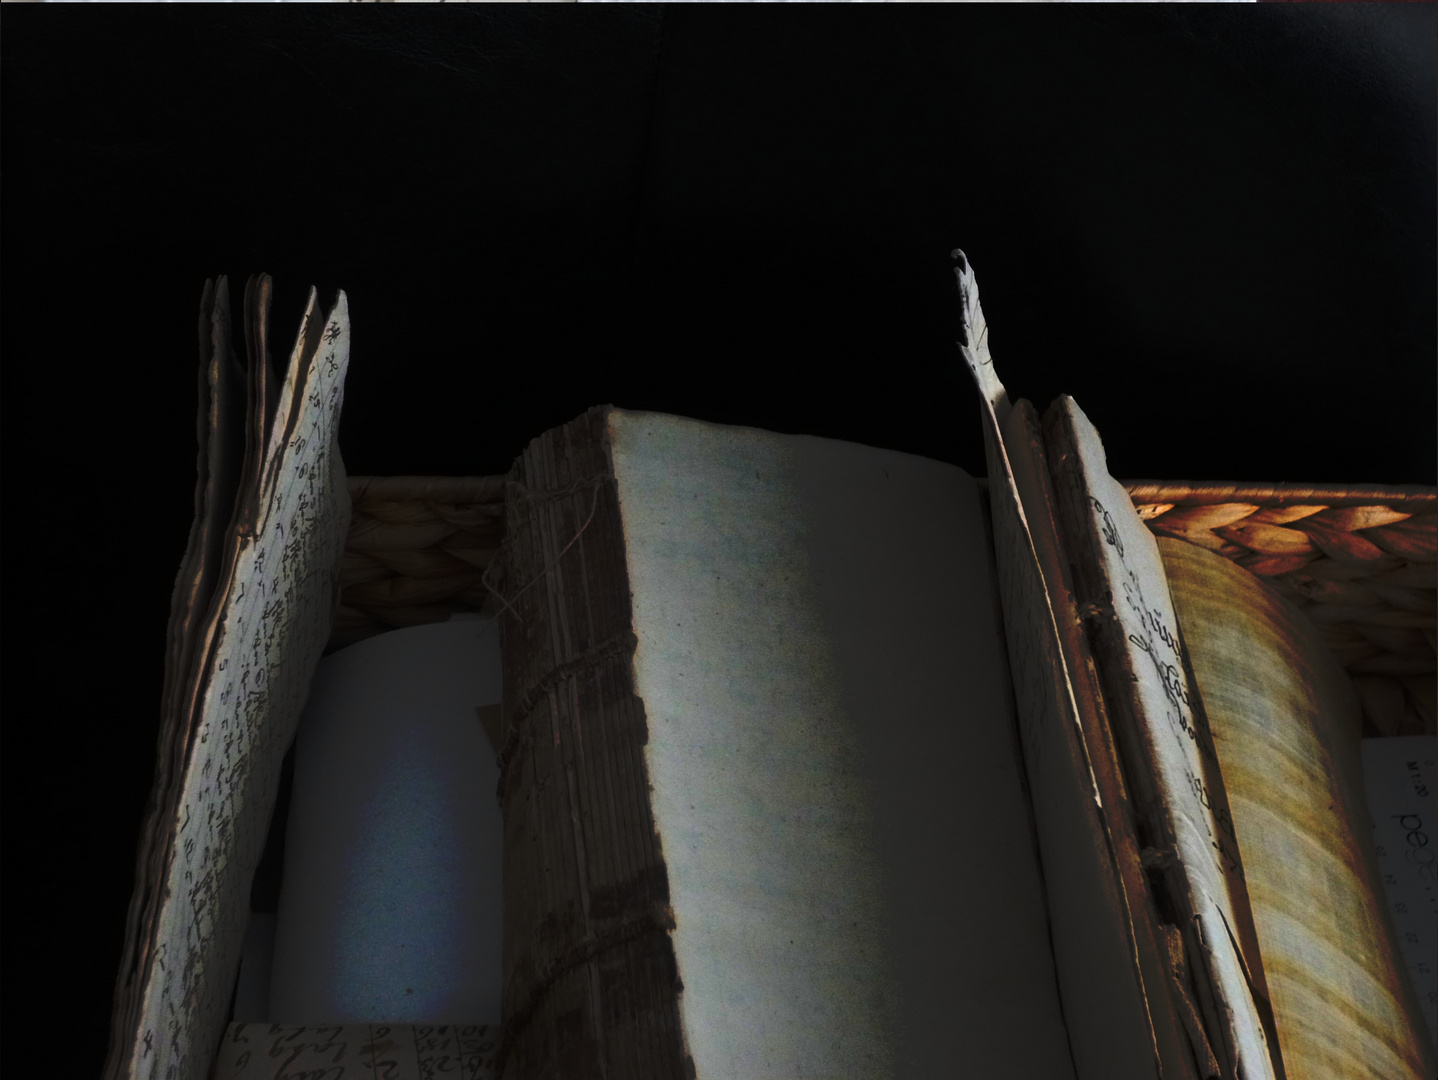 Bücher im Korb